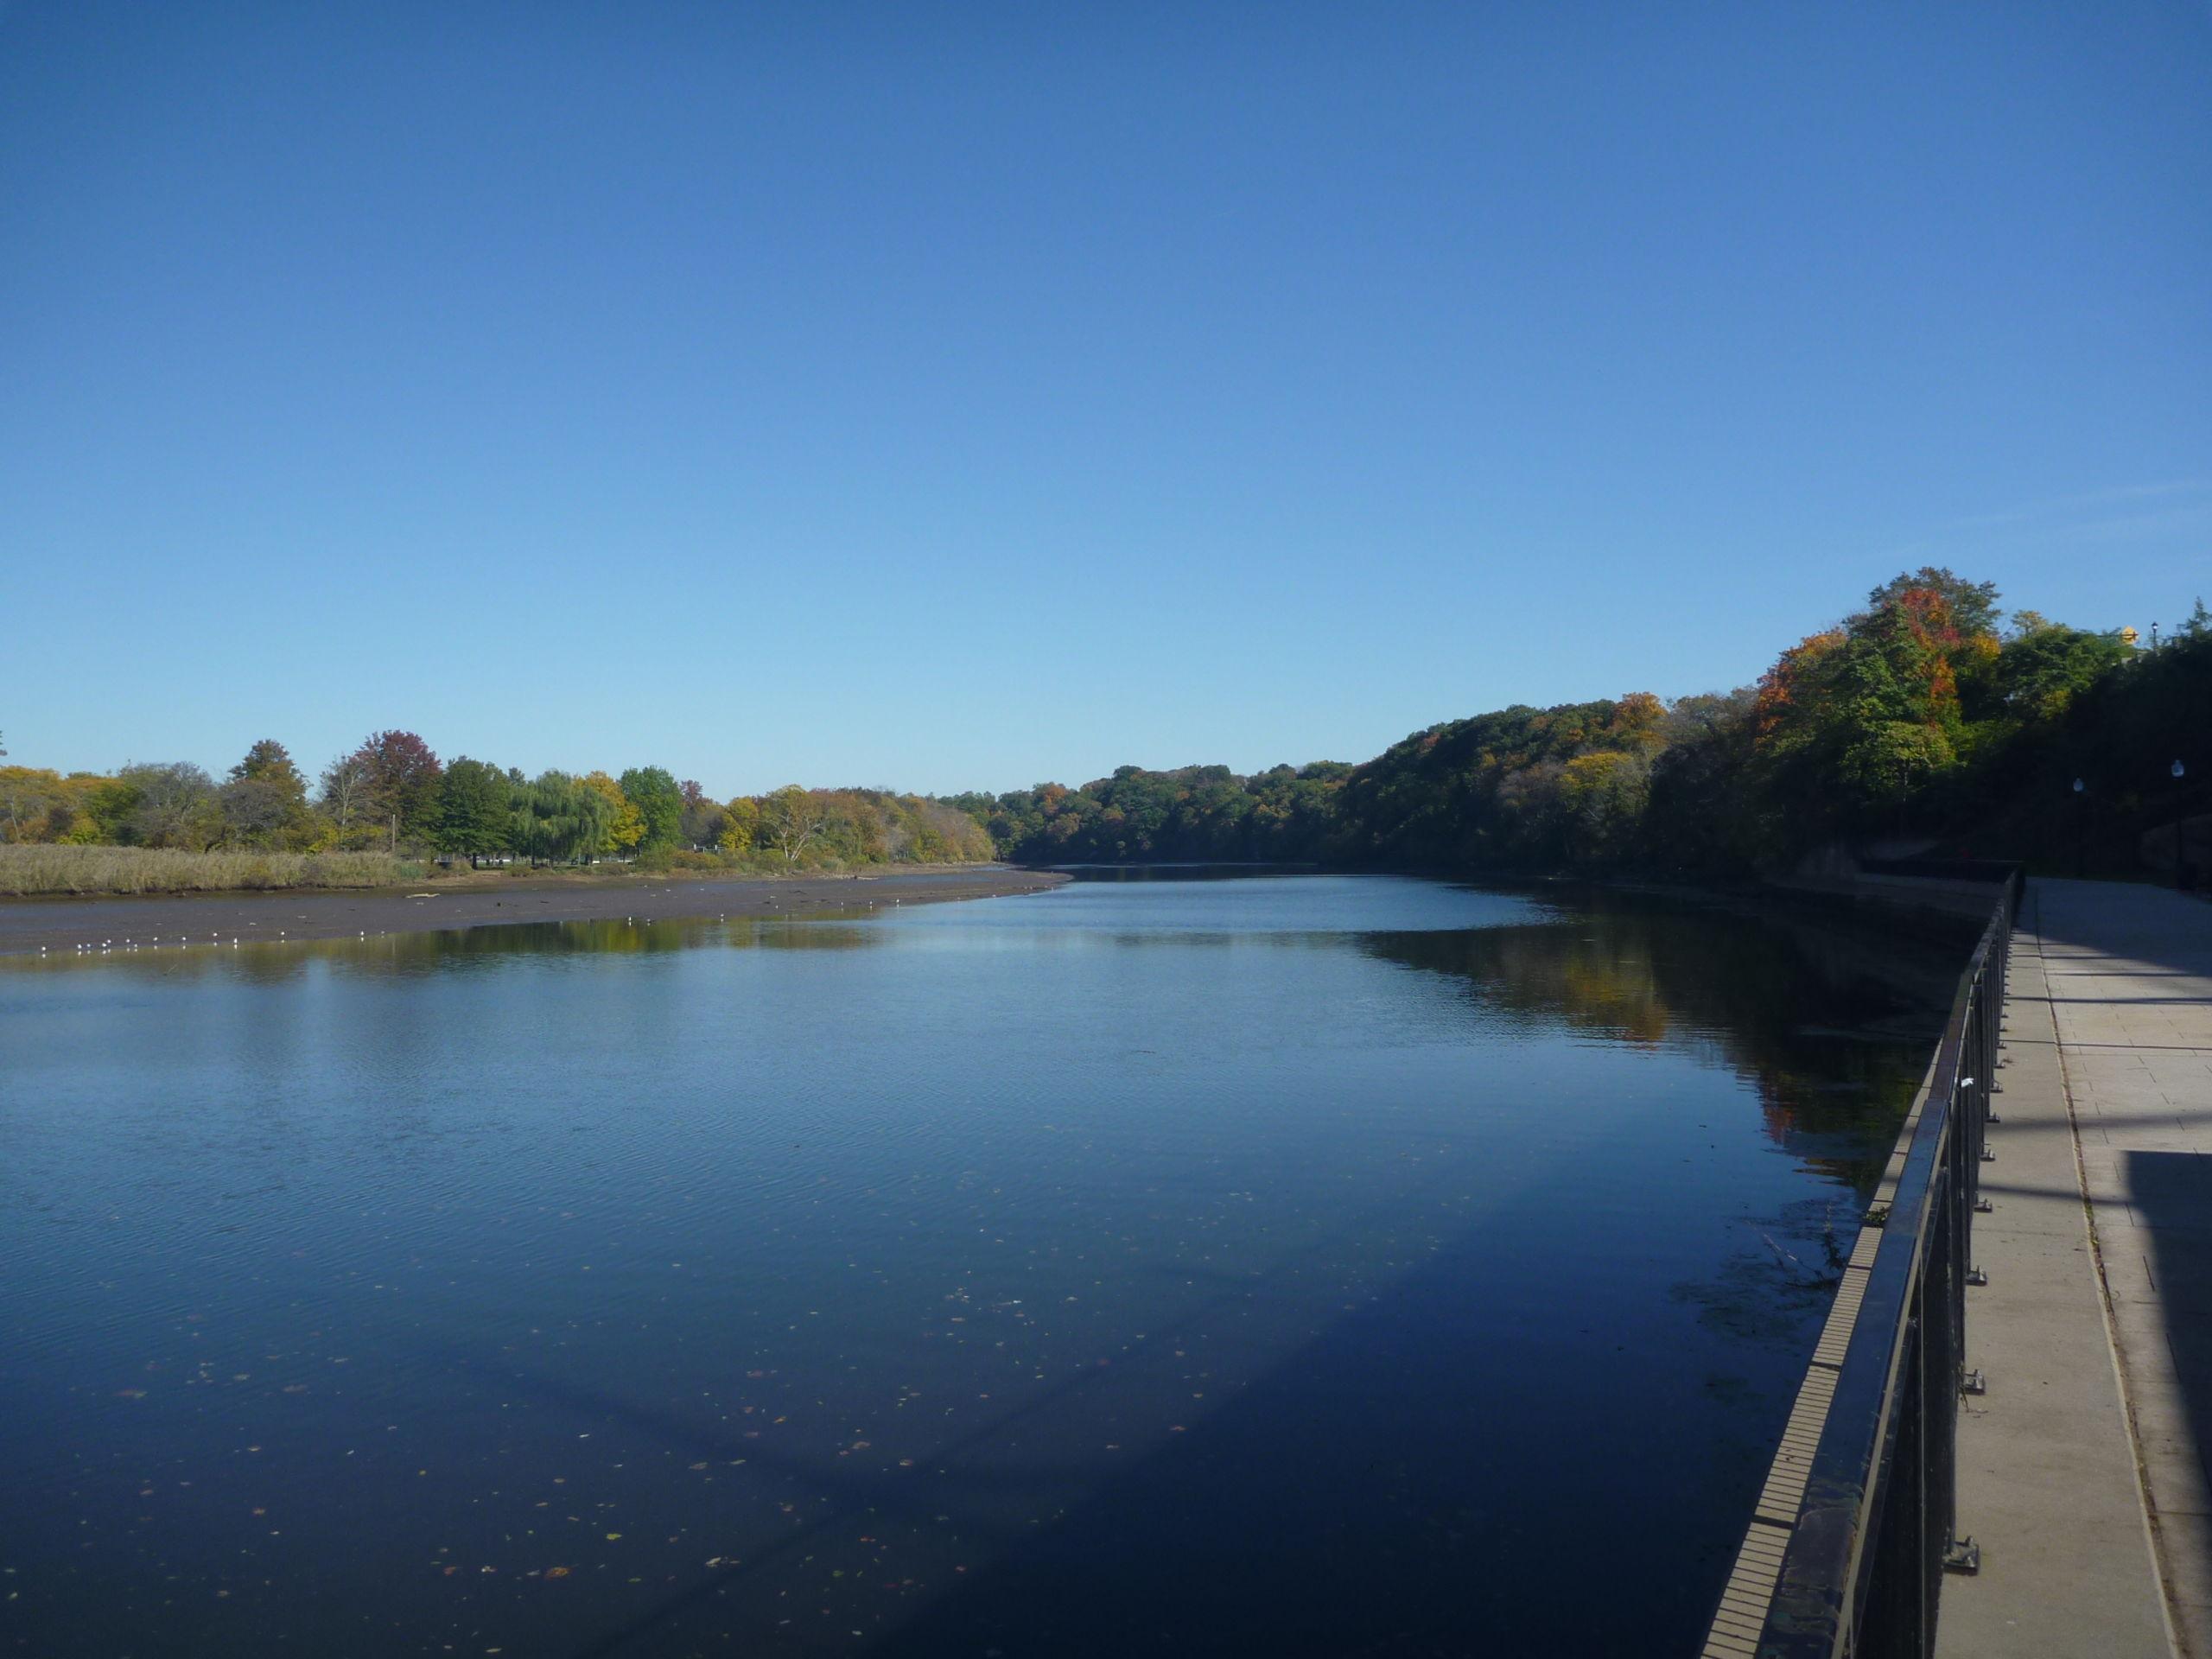 The Raritan River at Donaldson Park